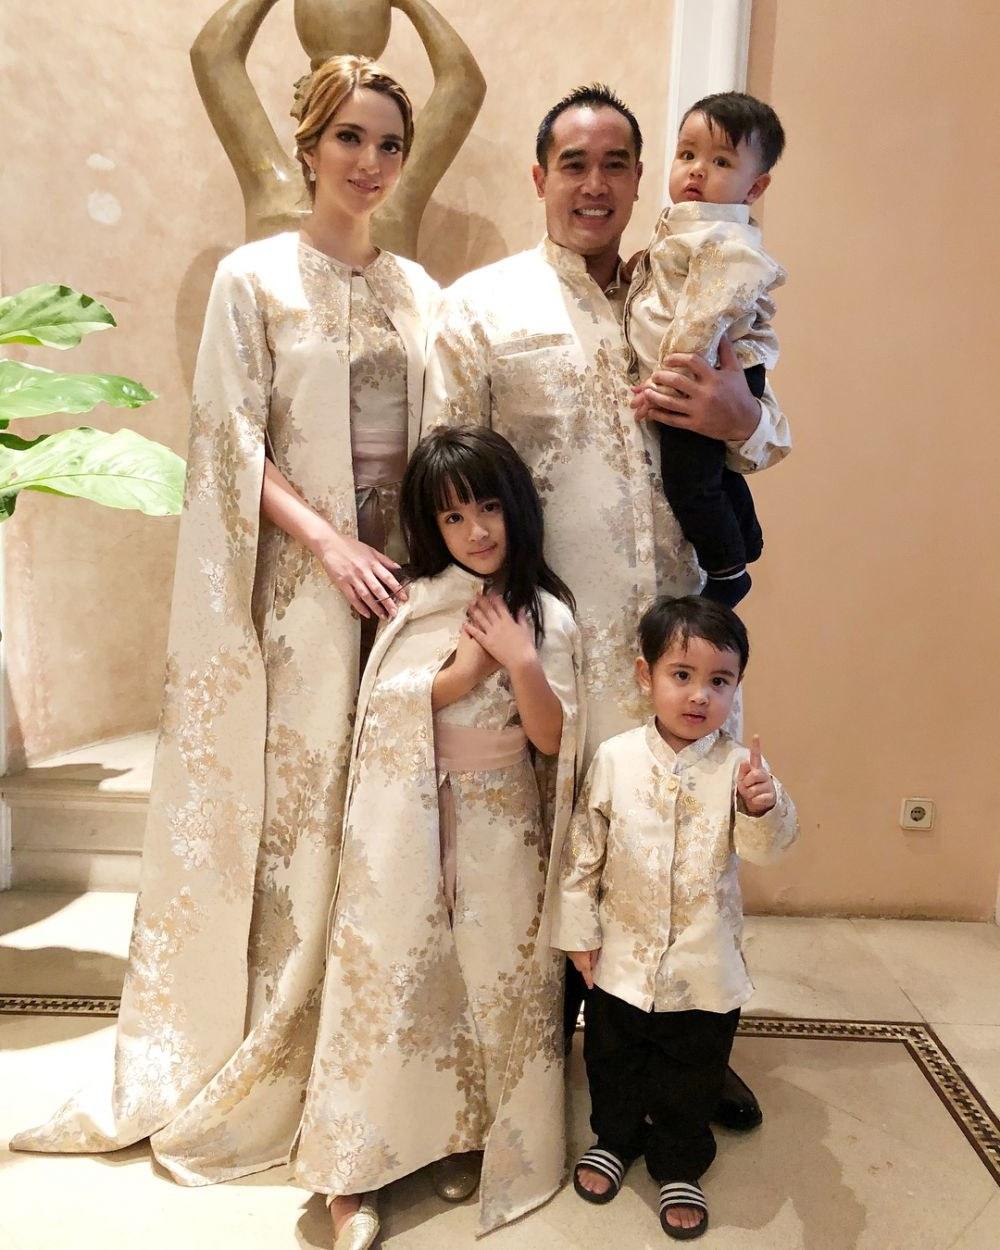 Design Model Baju Lebaran Seragam Keluarga 87dx Potret 16 Seleb Pakai Baju Kembaran Saat Lebaran Kompak Abis